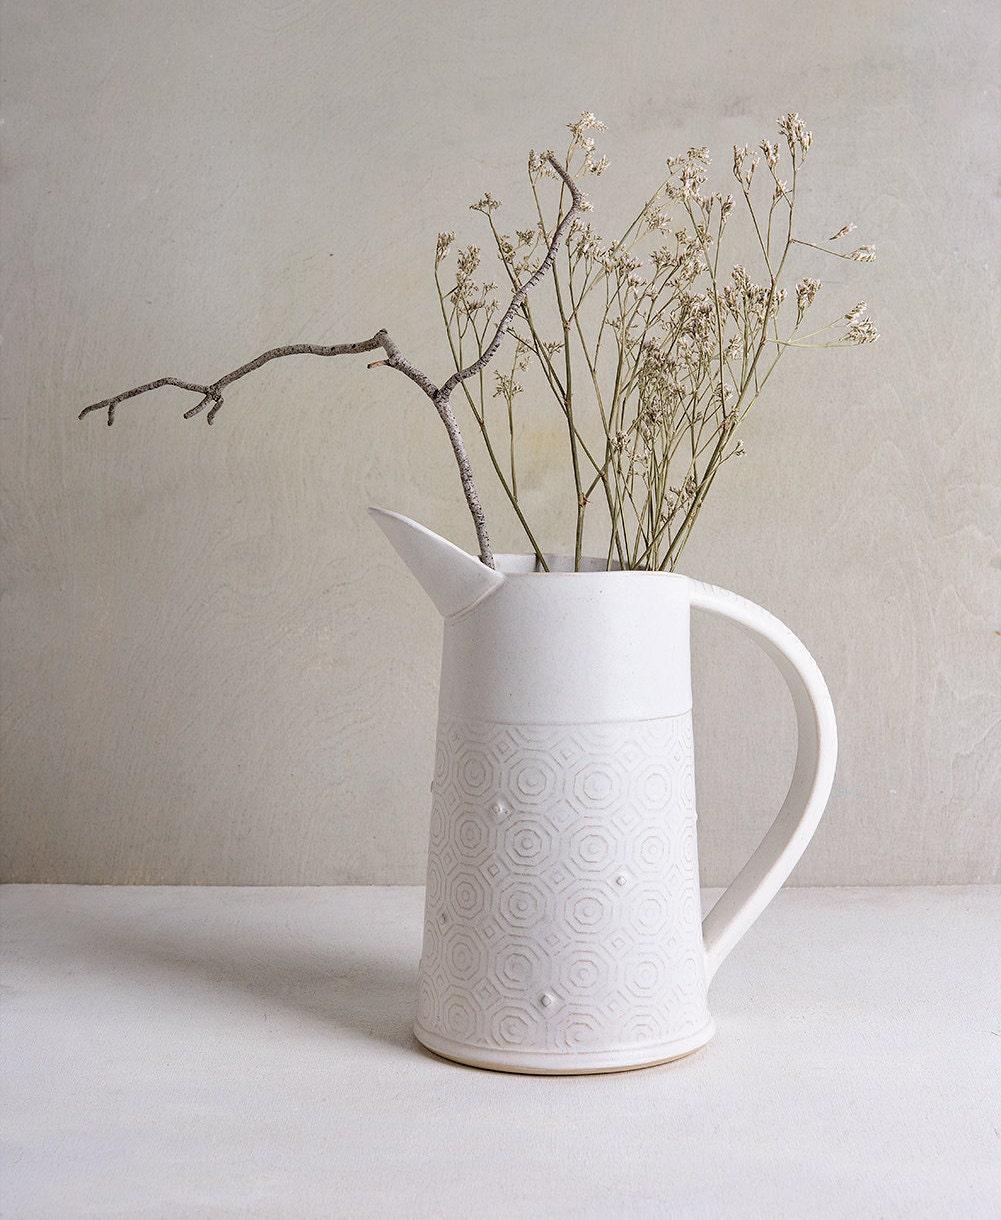 Pottery vase ceramic white vase white flower vase modern zoom reviewsmspy